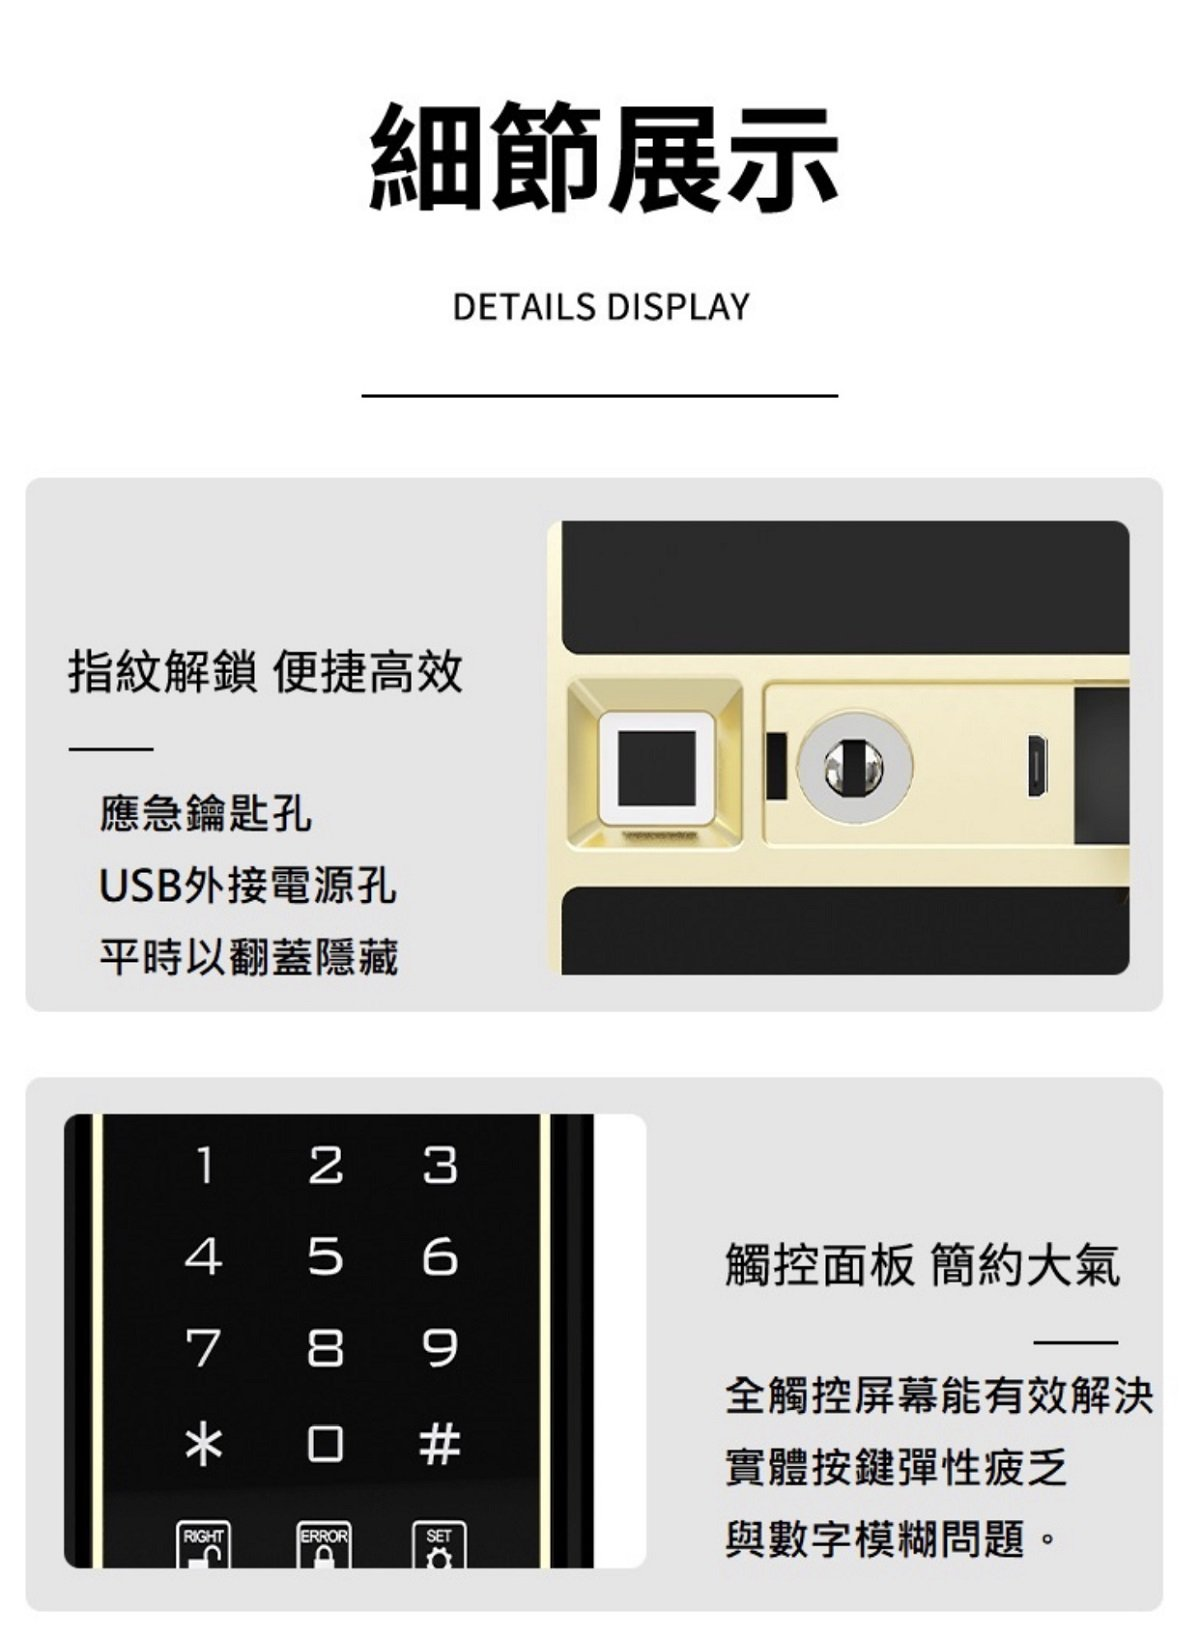 Marketing graphic-PB80-7